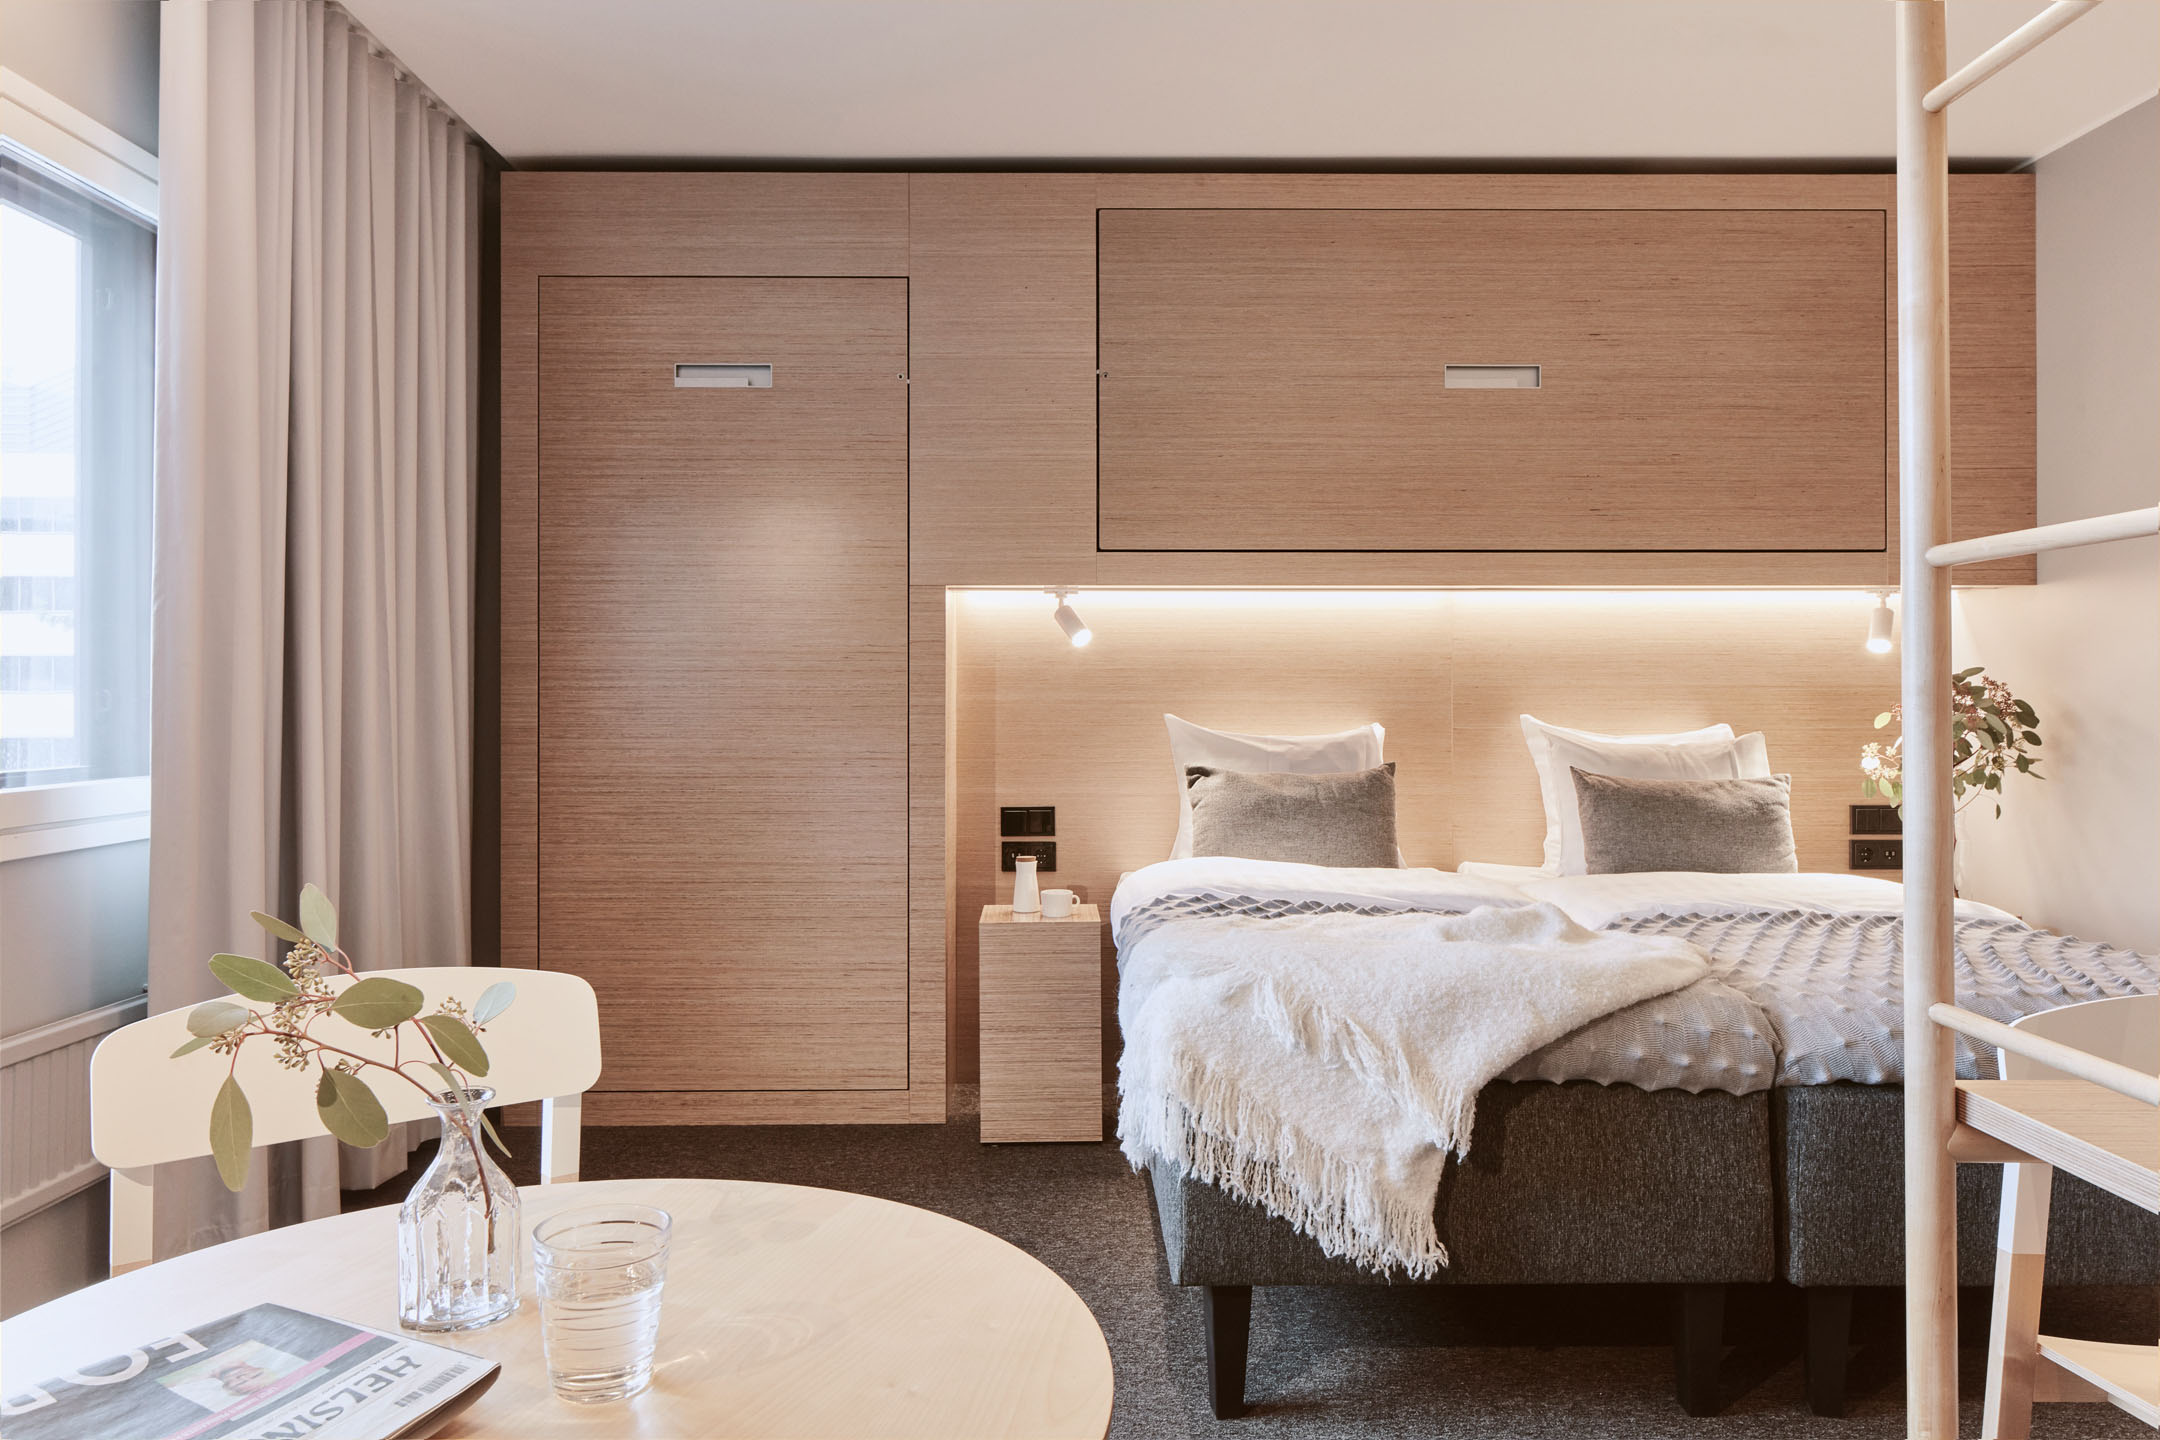 scandic helsinki aviacongress - design interior architects